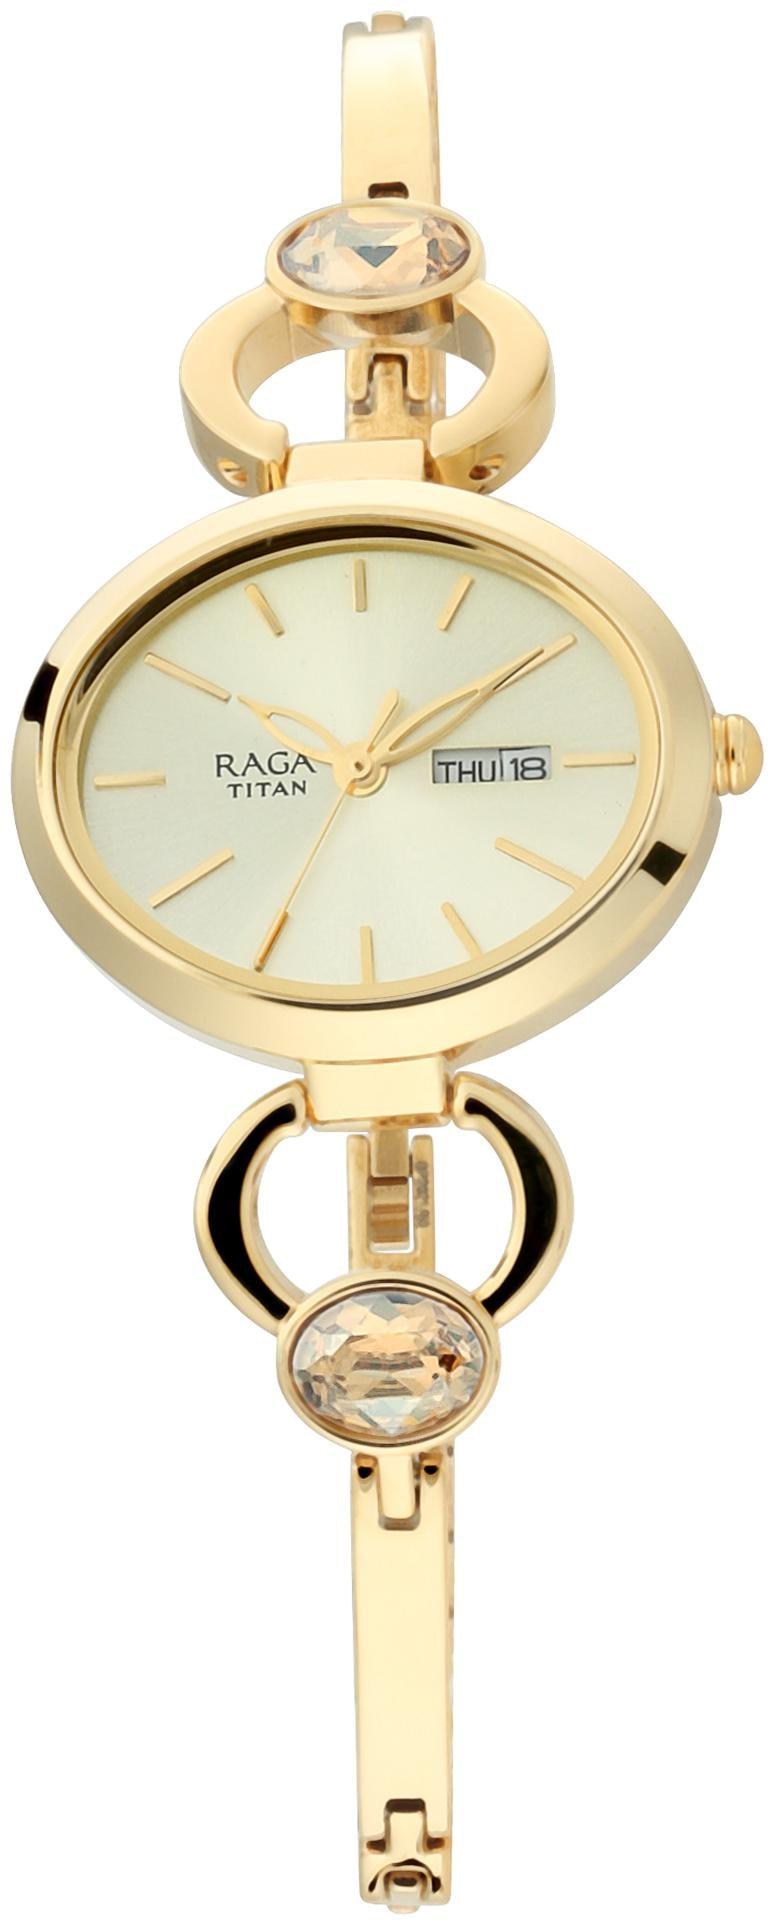 Titan Viva Raga Women Analog Watch by Titan Company